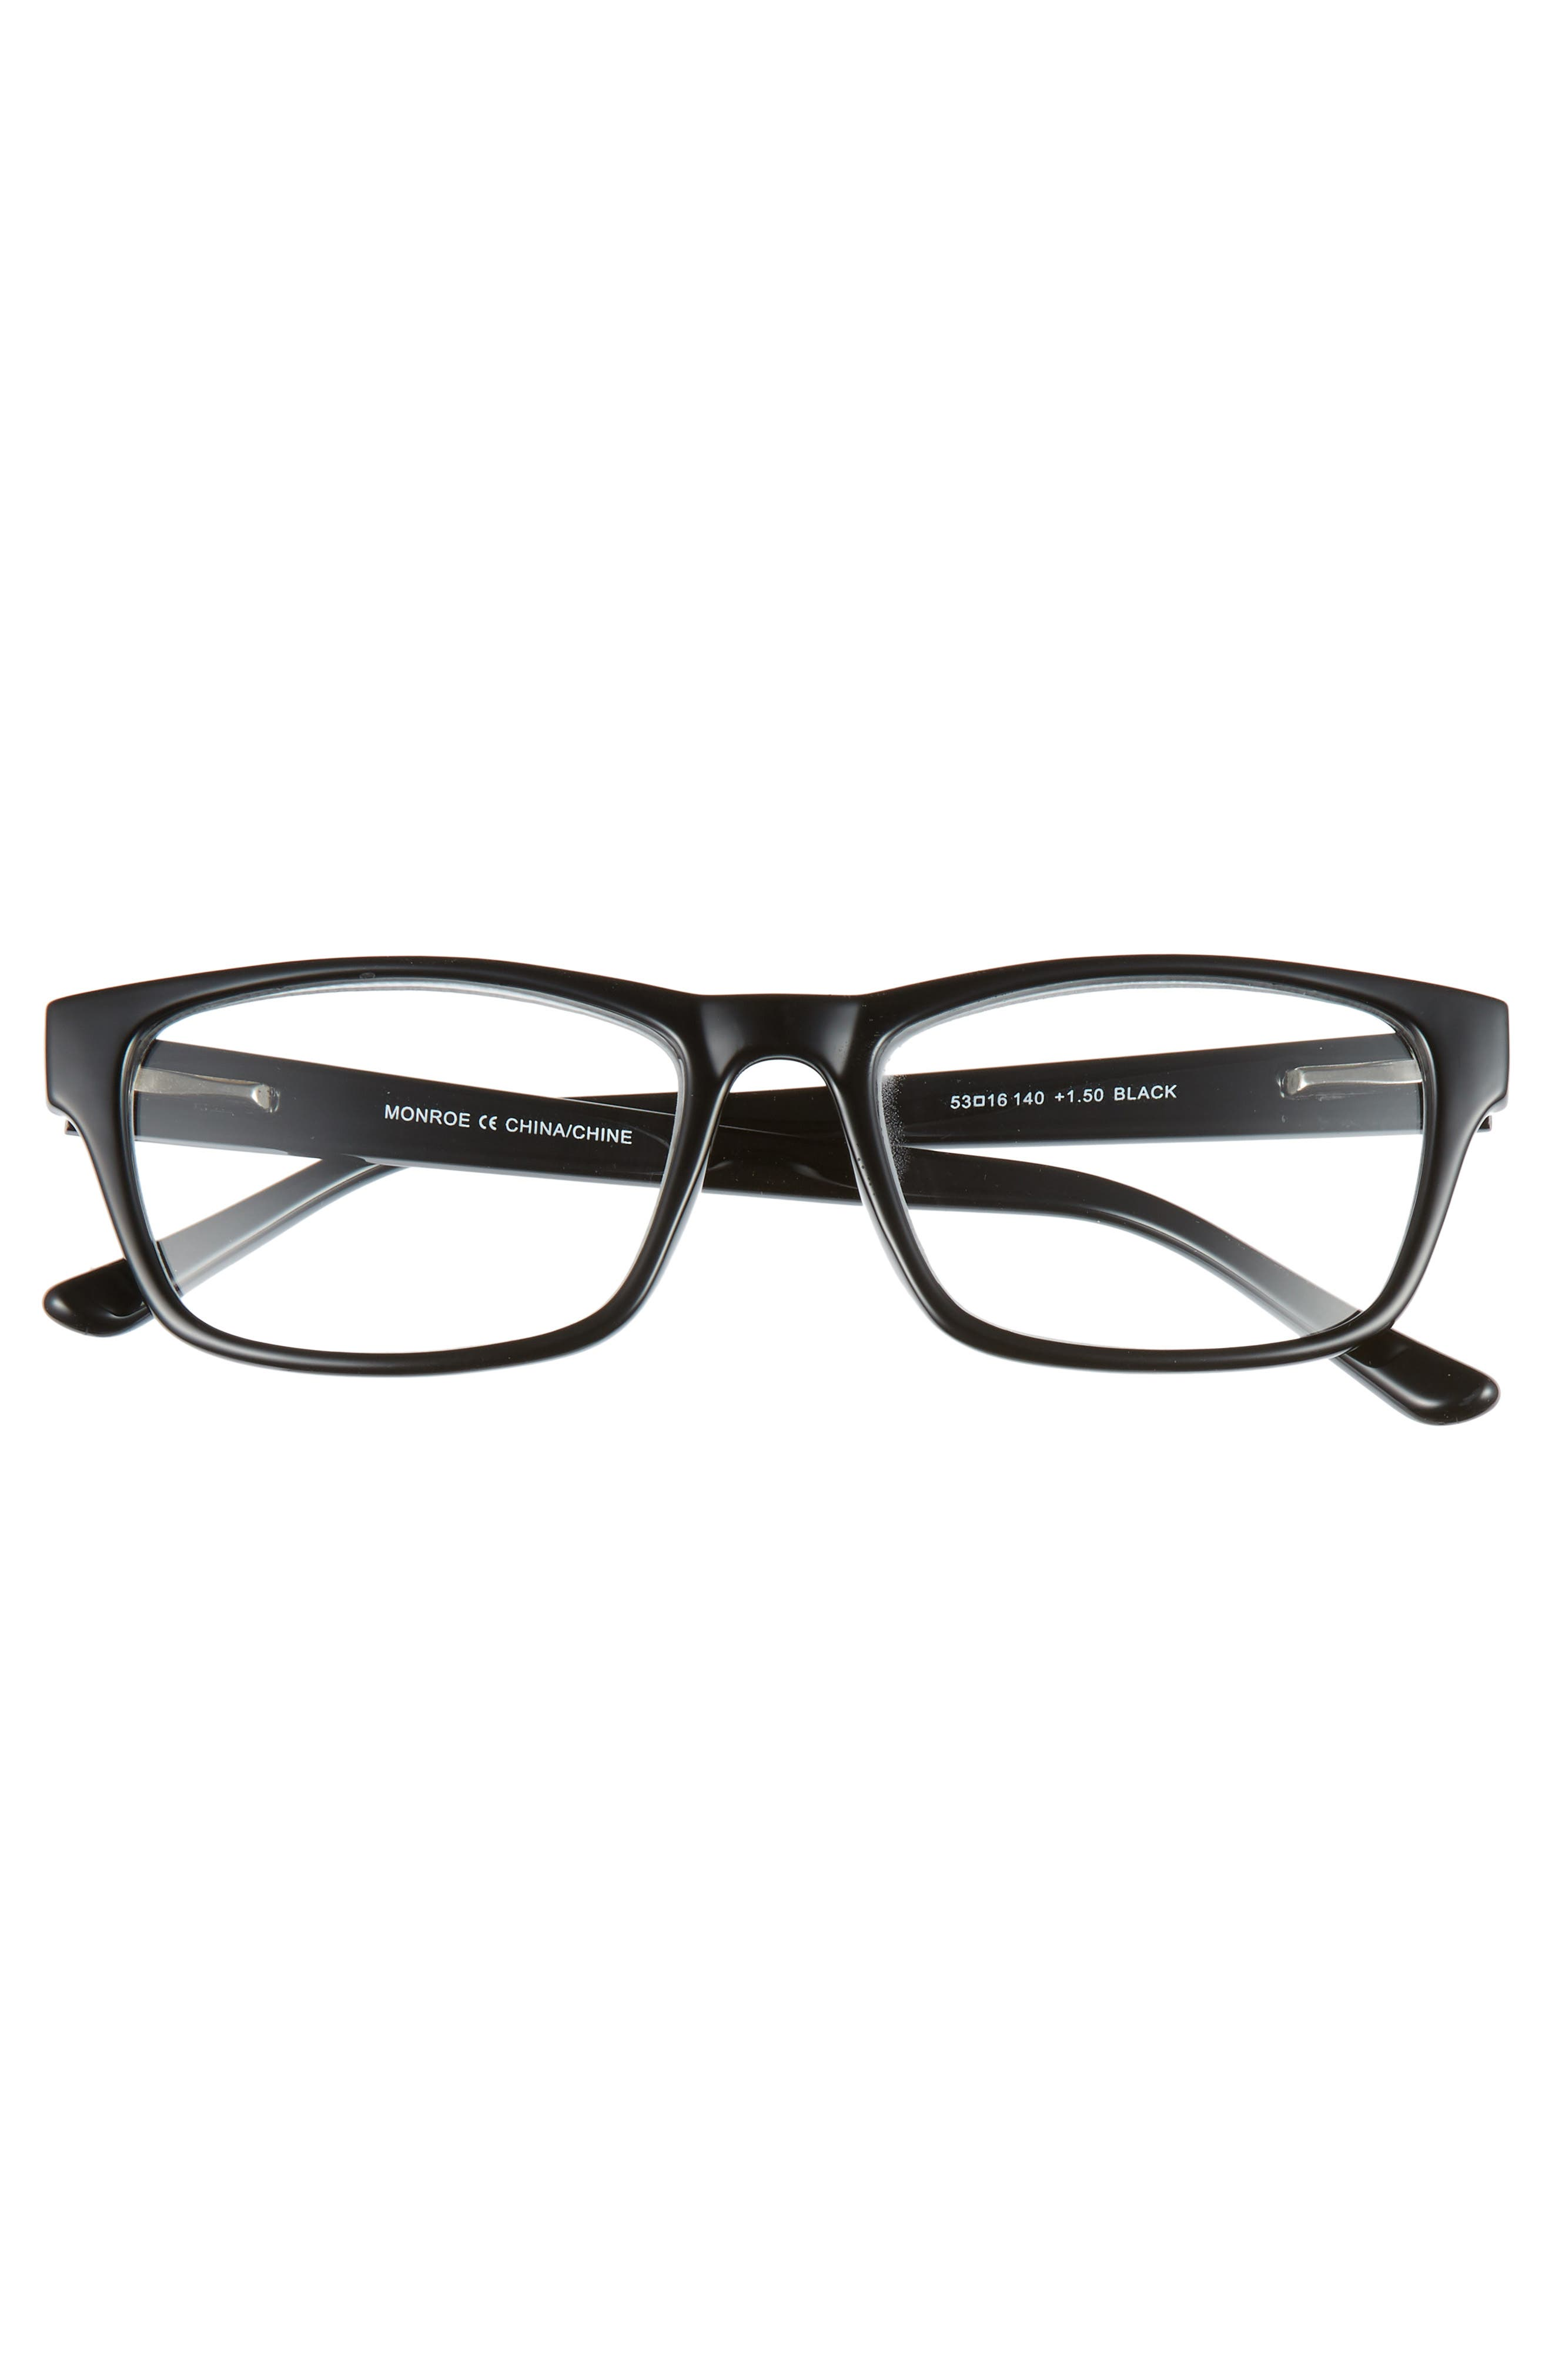 Monroe 53mm Reading Glasses,                             Alternate thumbnail 2, color,                             BLACK